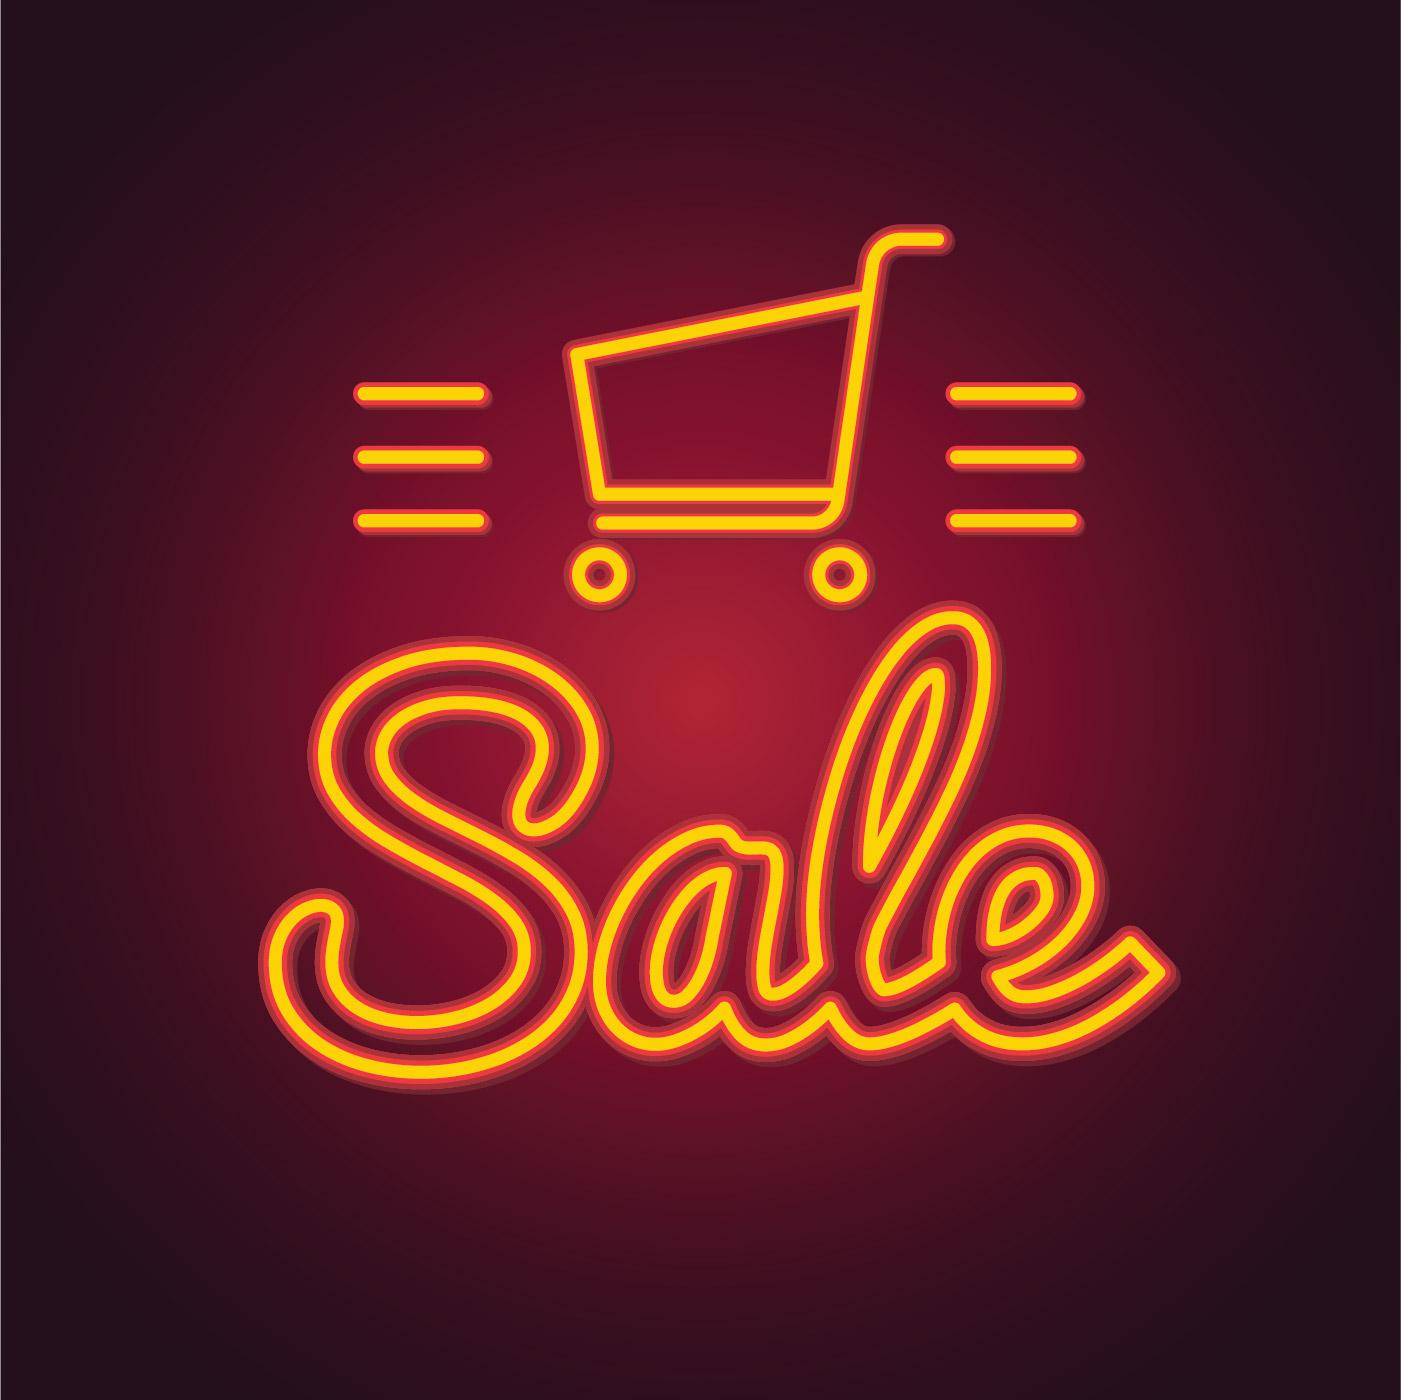 Bright Neon Sale Sign Download Free Vector Art Stock Graphics